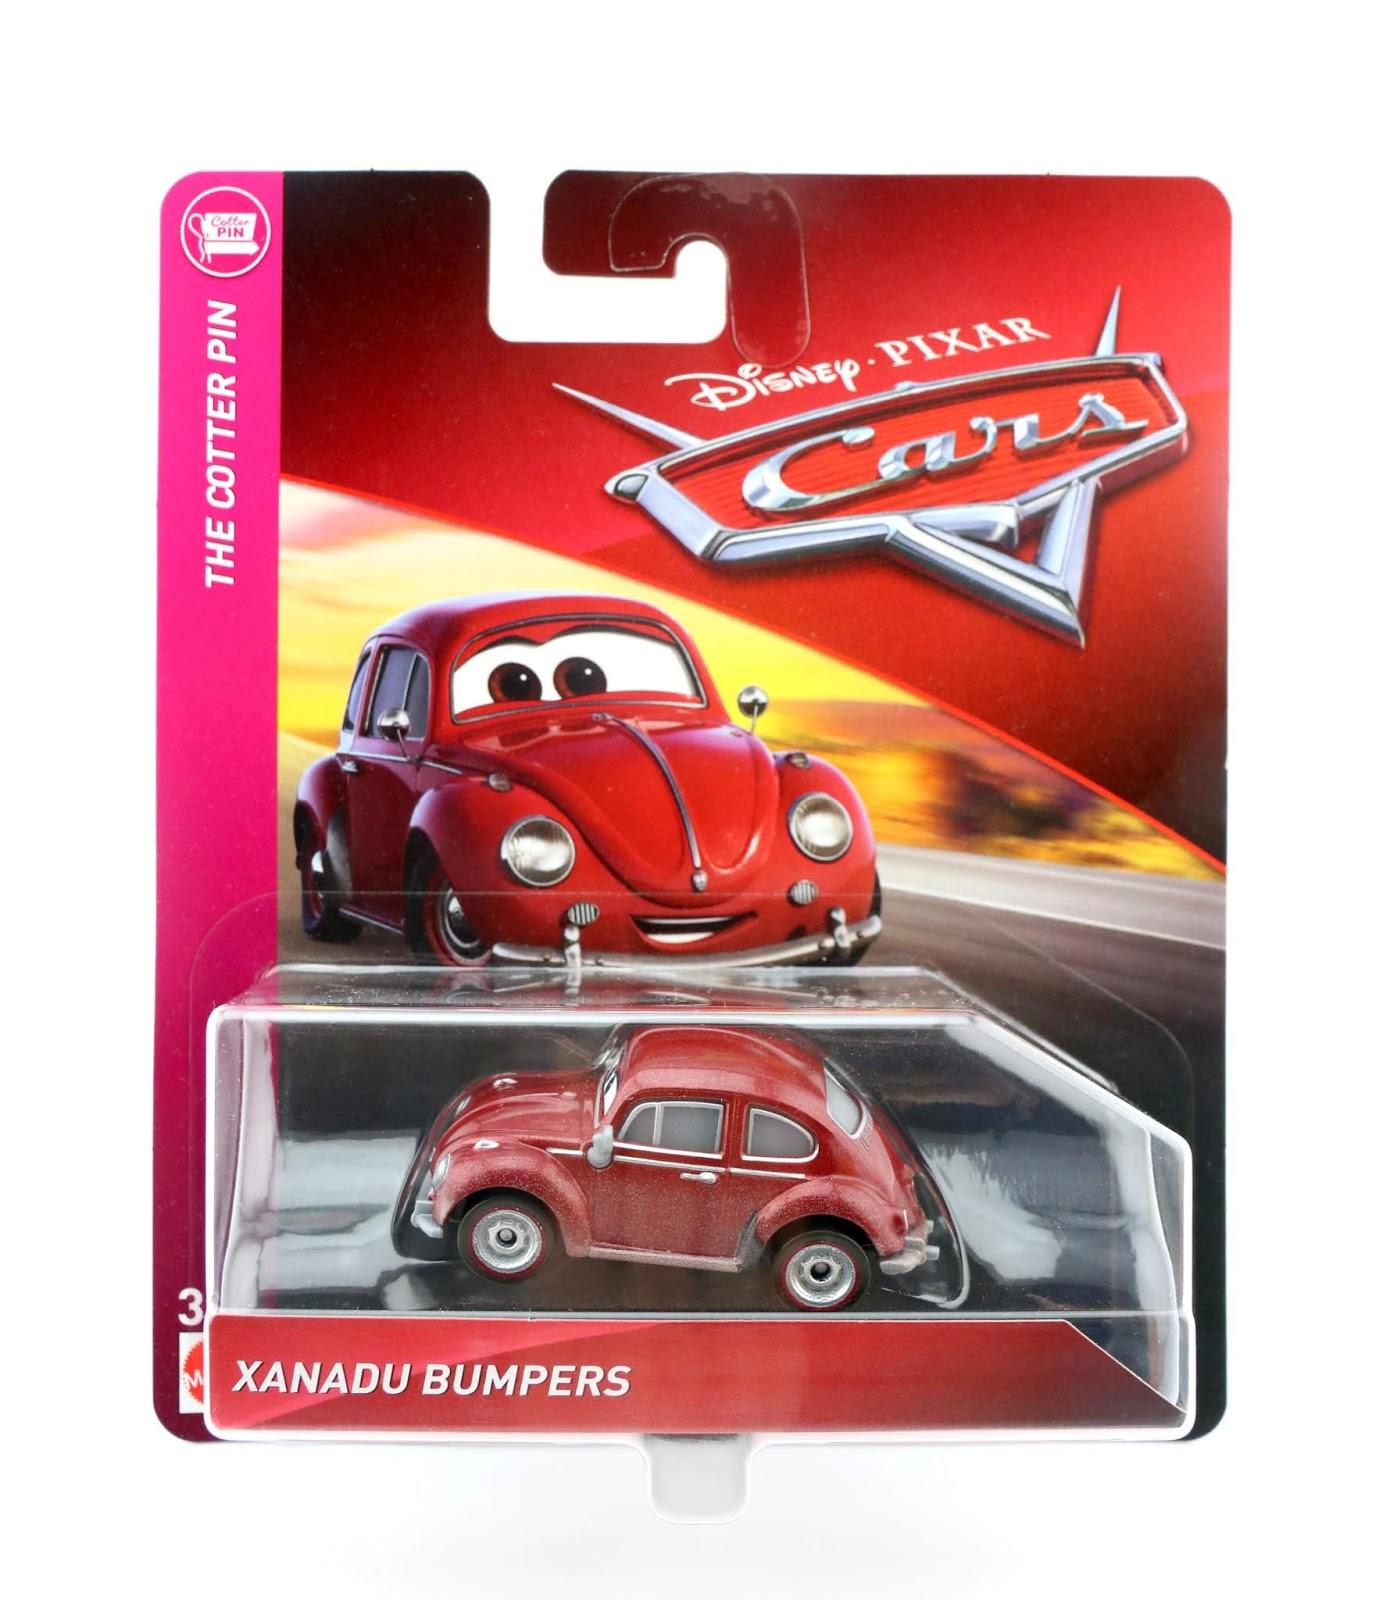 Cars 3 Xanadu Bumpers